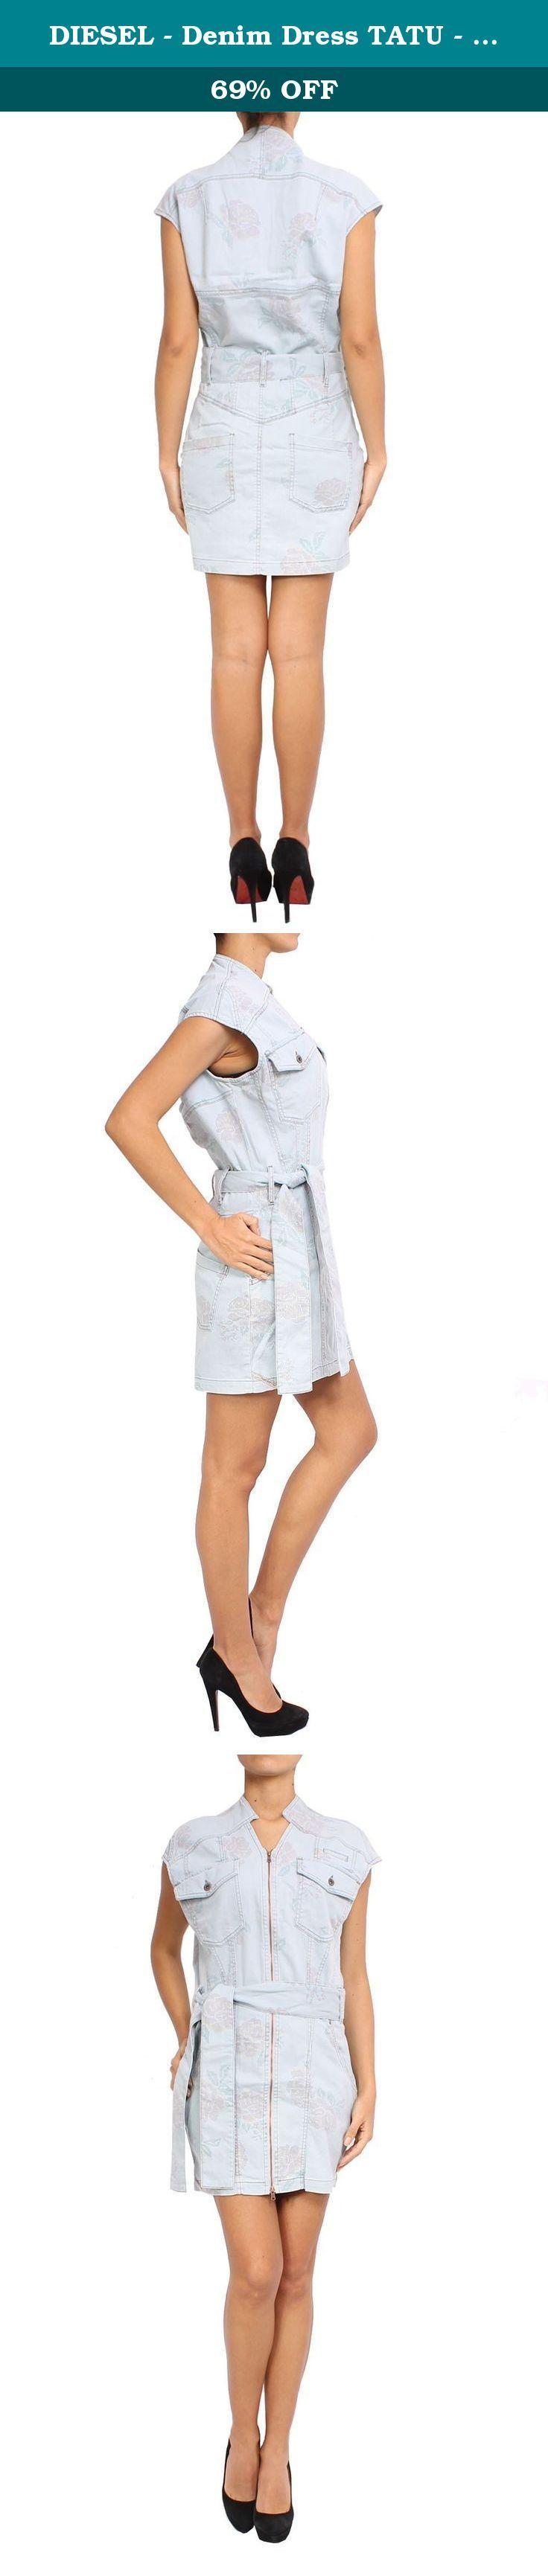 DIESEL - Denim Dress TATU - blue, S. Collar Type: Half-Zip. Sleeve type: Sleeveless. Composition: 76% Cotton 22% Lyocell 2% Elastane.